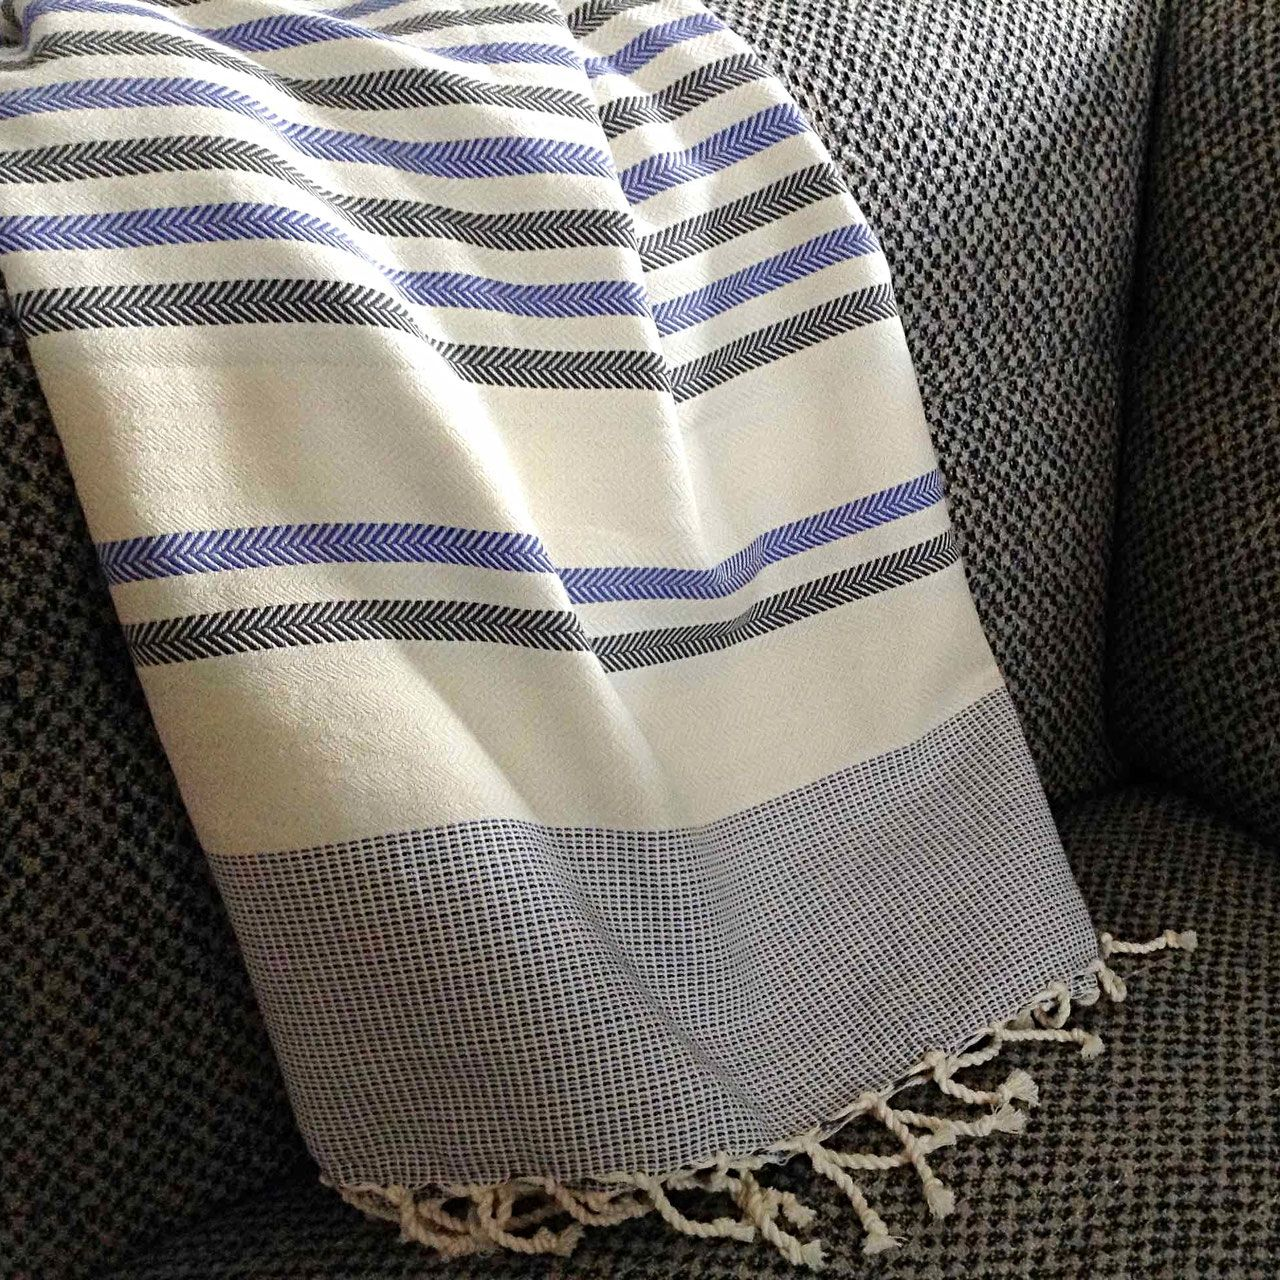 Fouta Tunisienne De Plage Chevron Adgart Fabric Weaving Linen